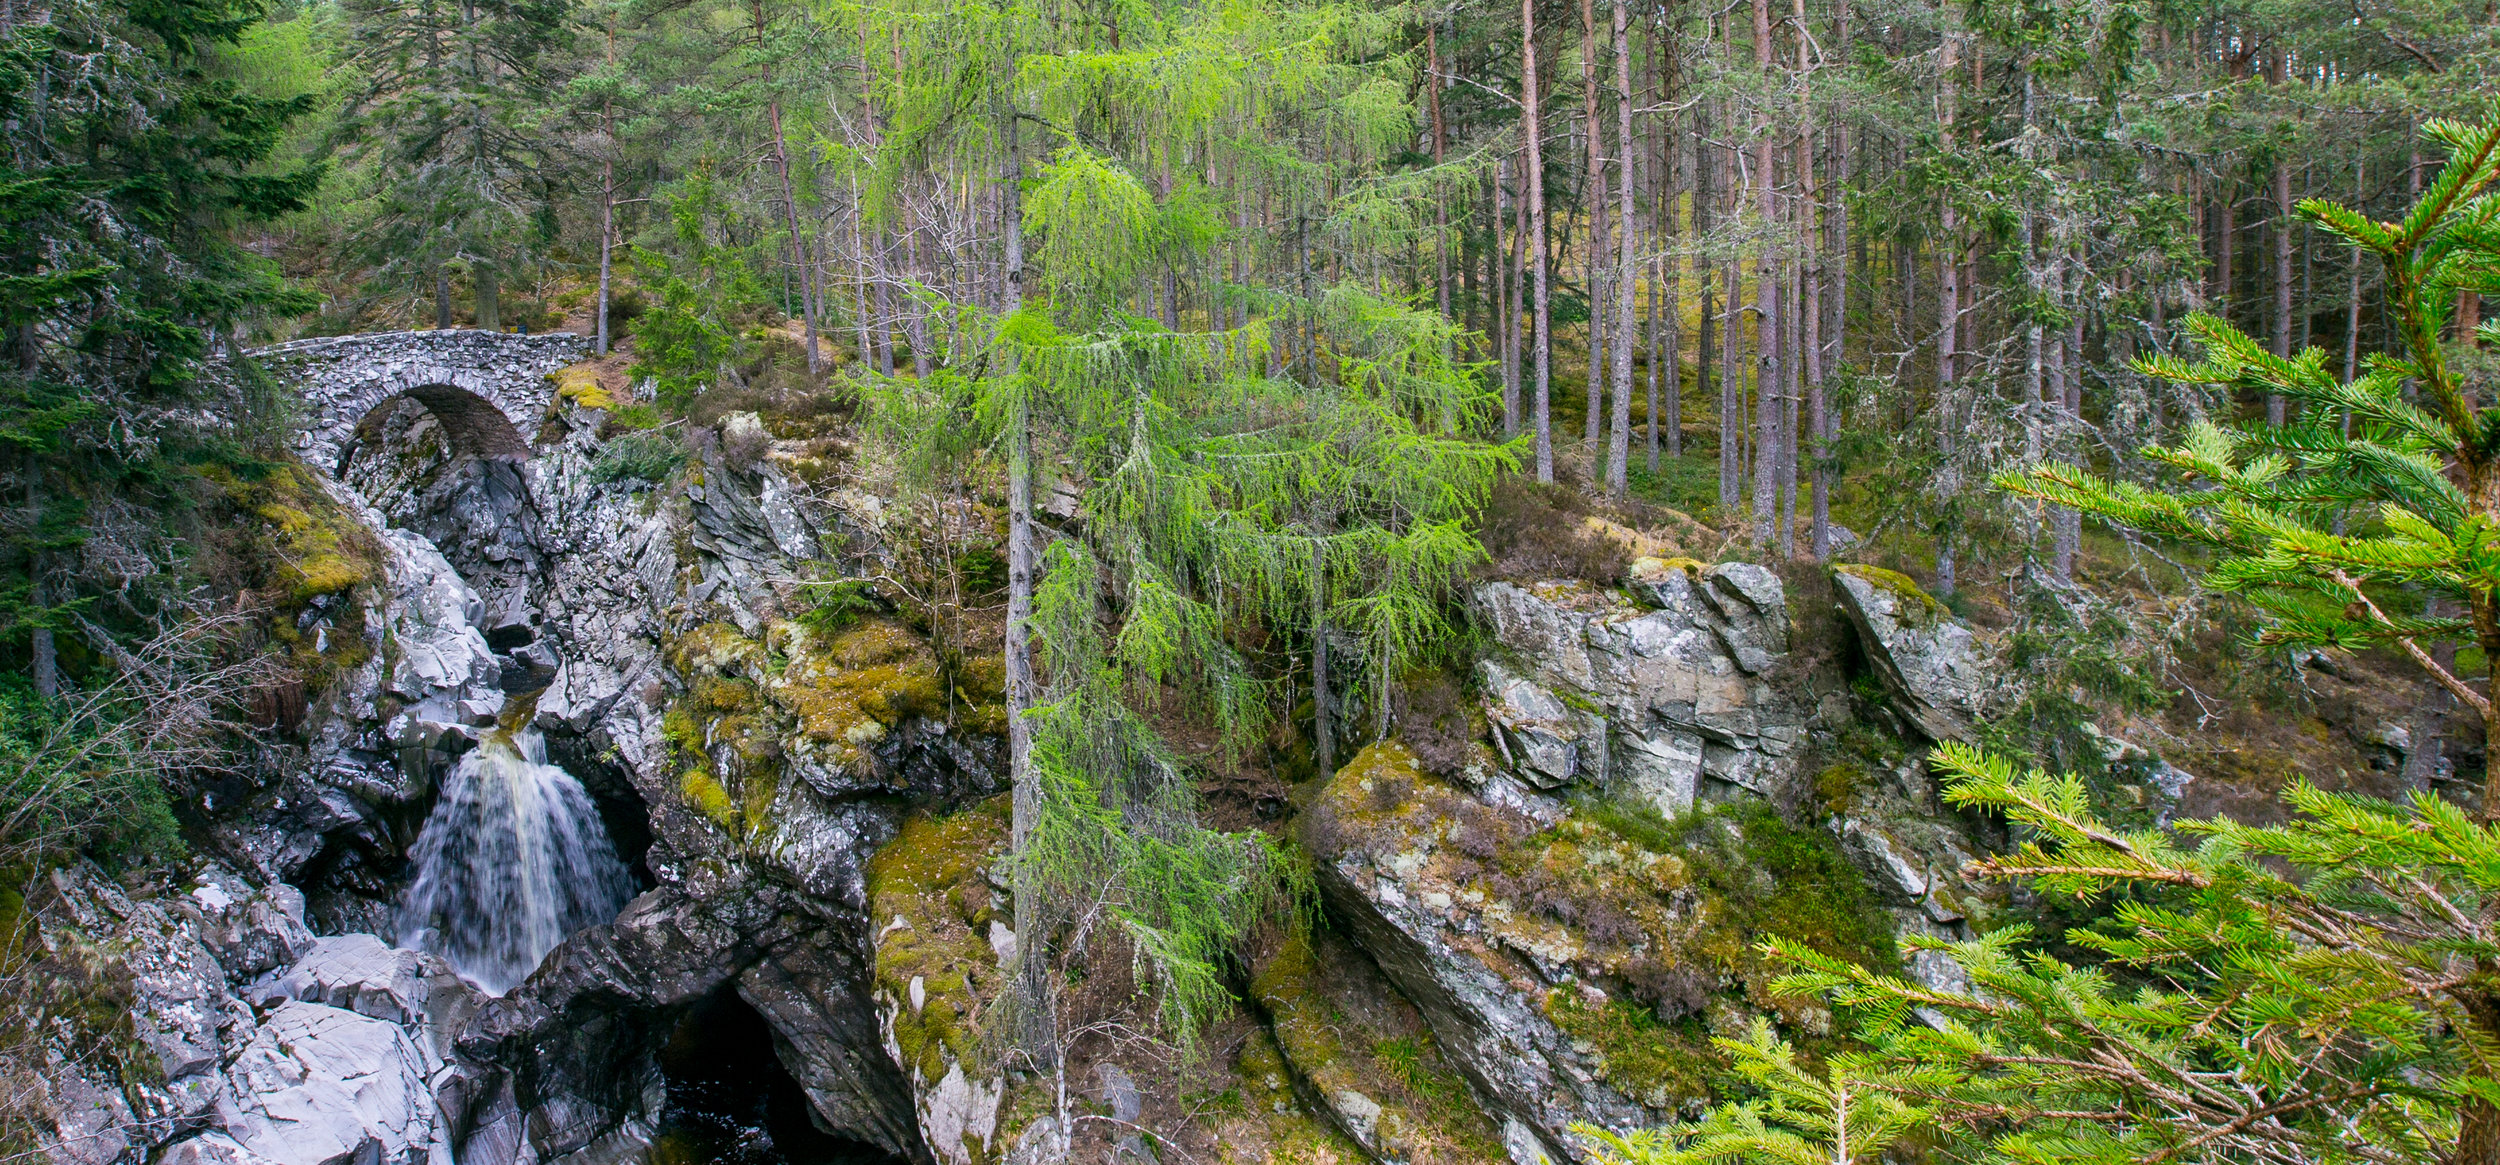 scotland bruar falls 2015 © jennifer bailey